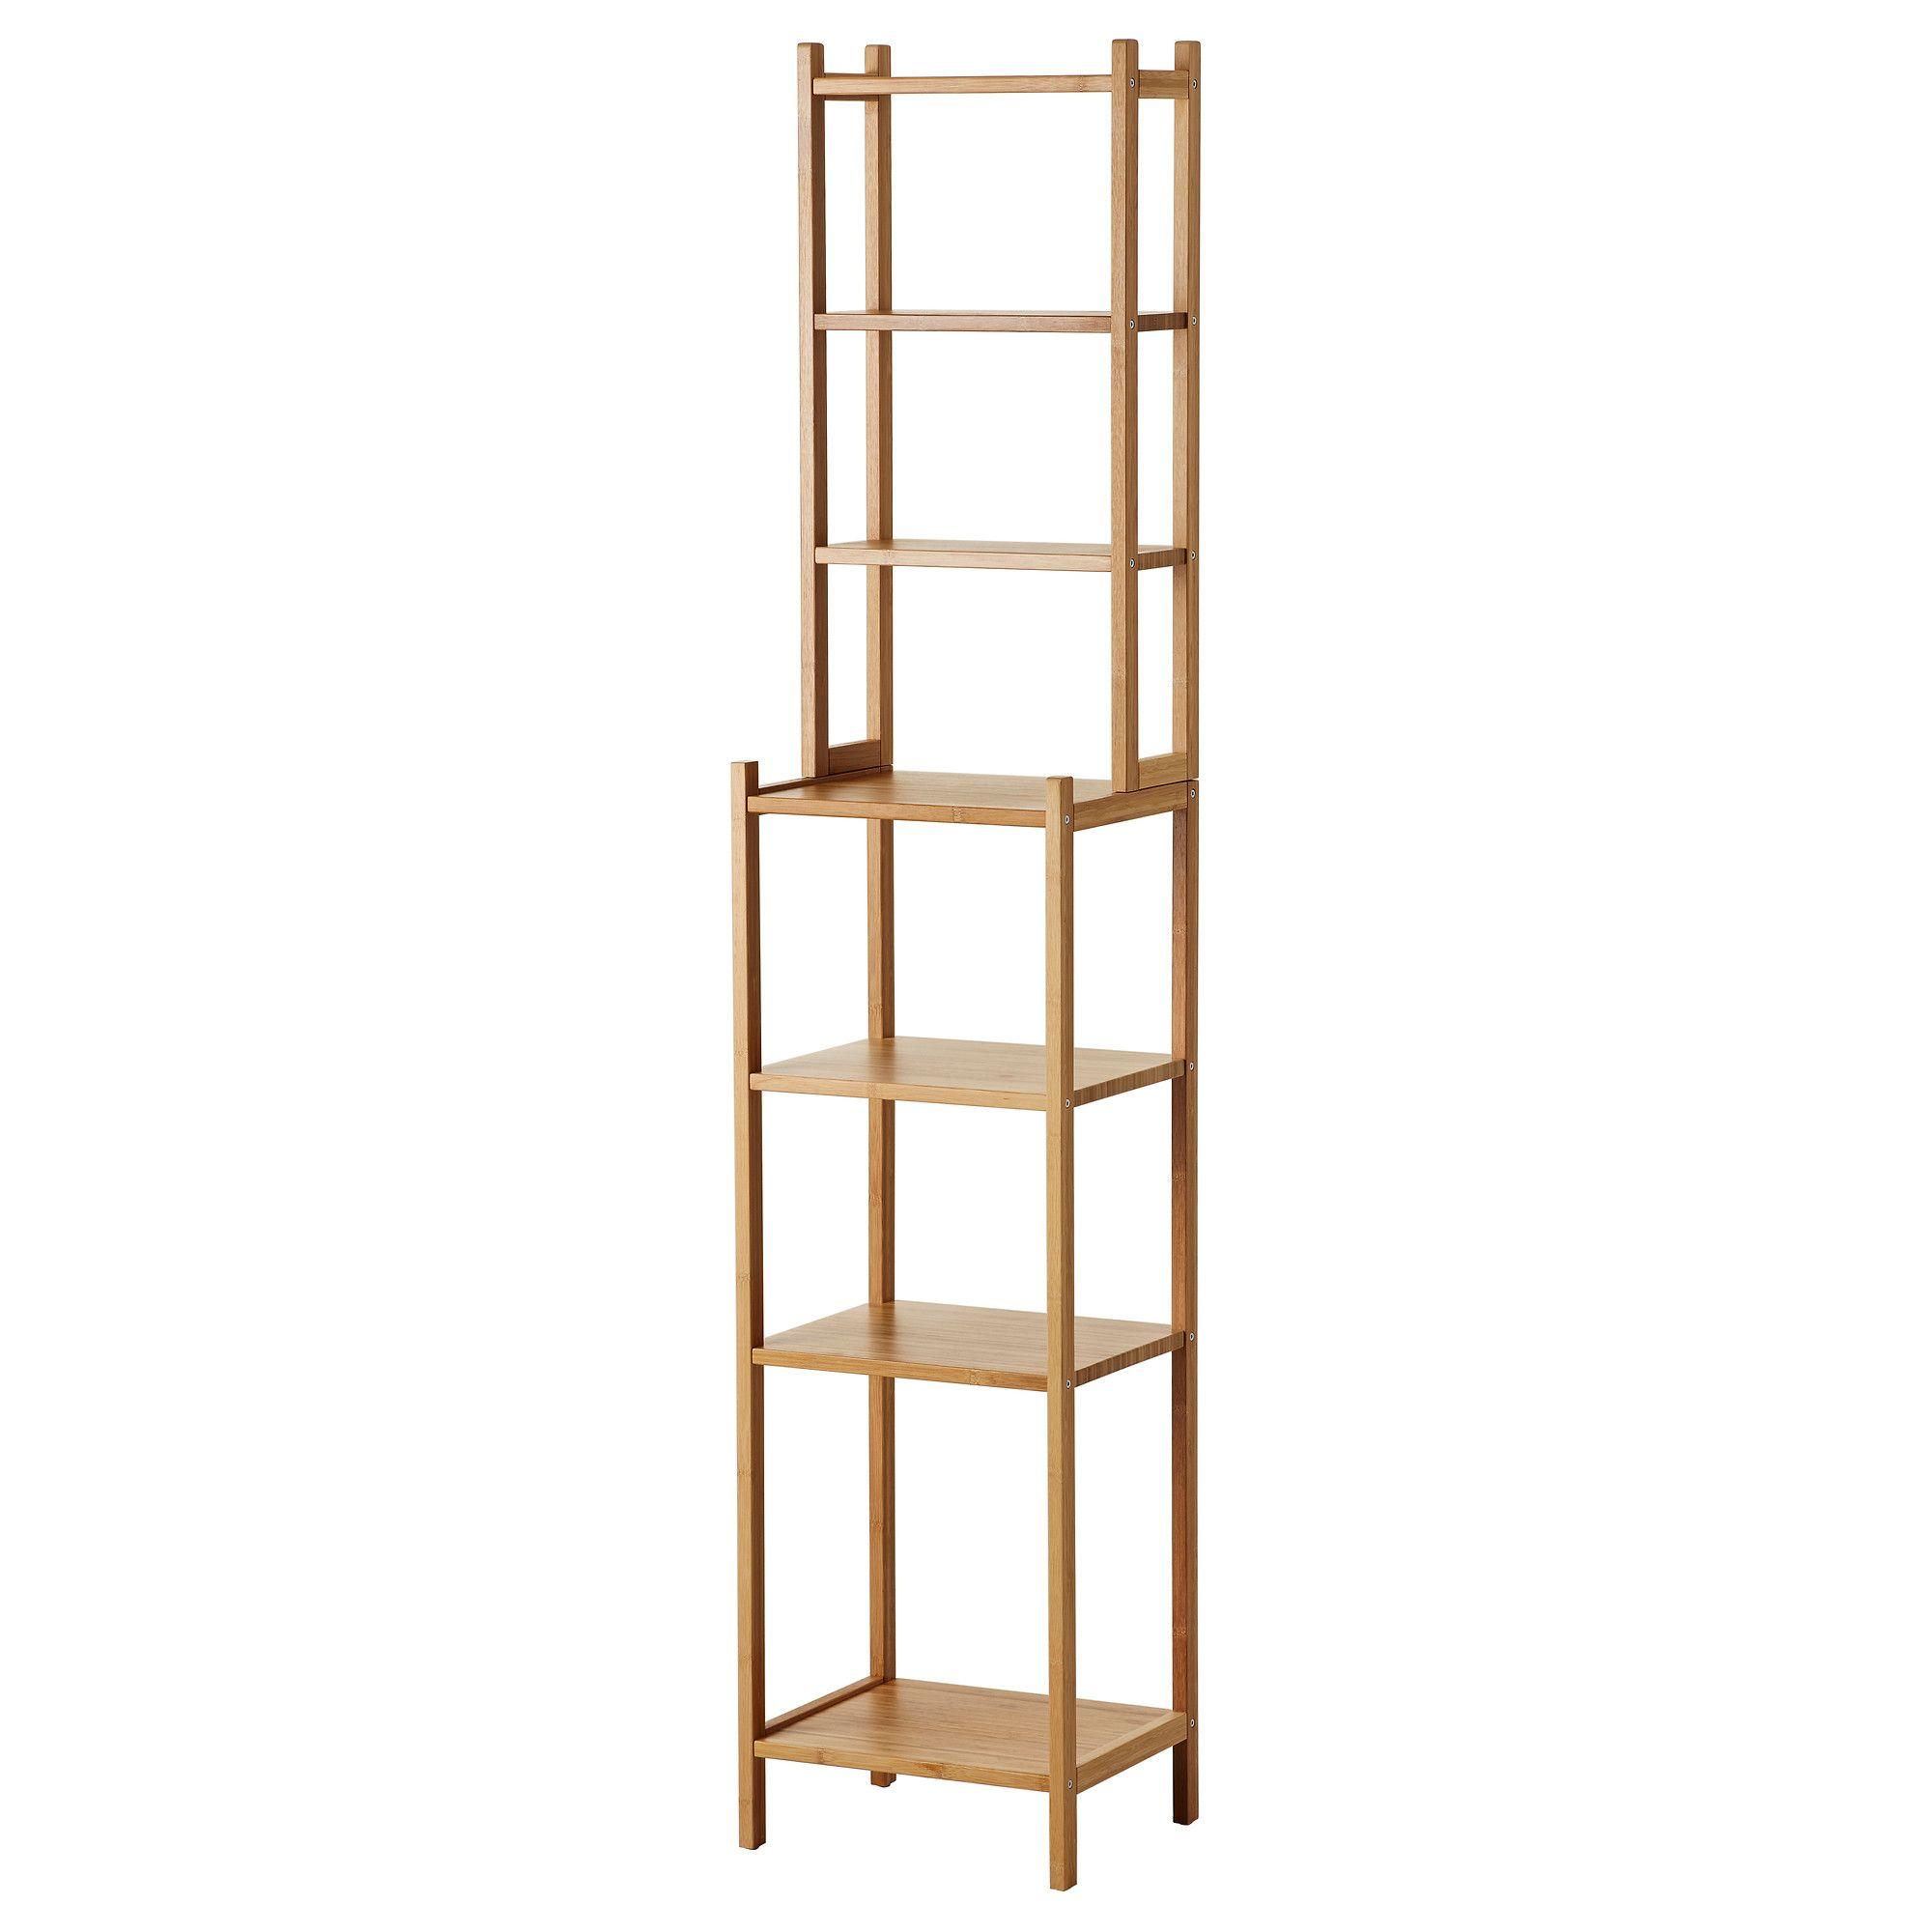 RÅGRUND Shelving unit IKEA | Ikea shelf unit, Ikea